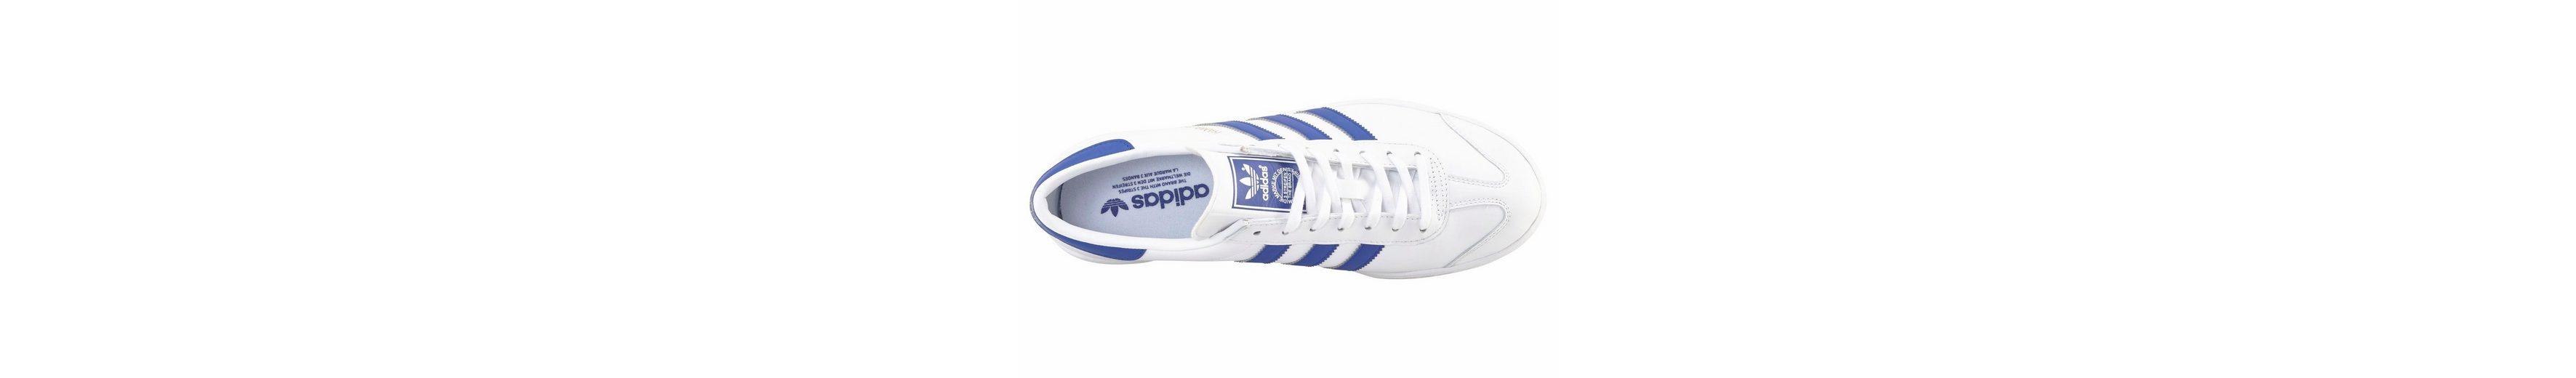 Steckdose Vermarktbaren Bestseller adidas Originals Hamburg Sneaker Billig Verkauf 2018  Verkaufsschlager Billig Authentisch Auslass BPQUIqVAO3